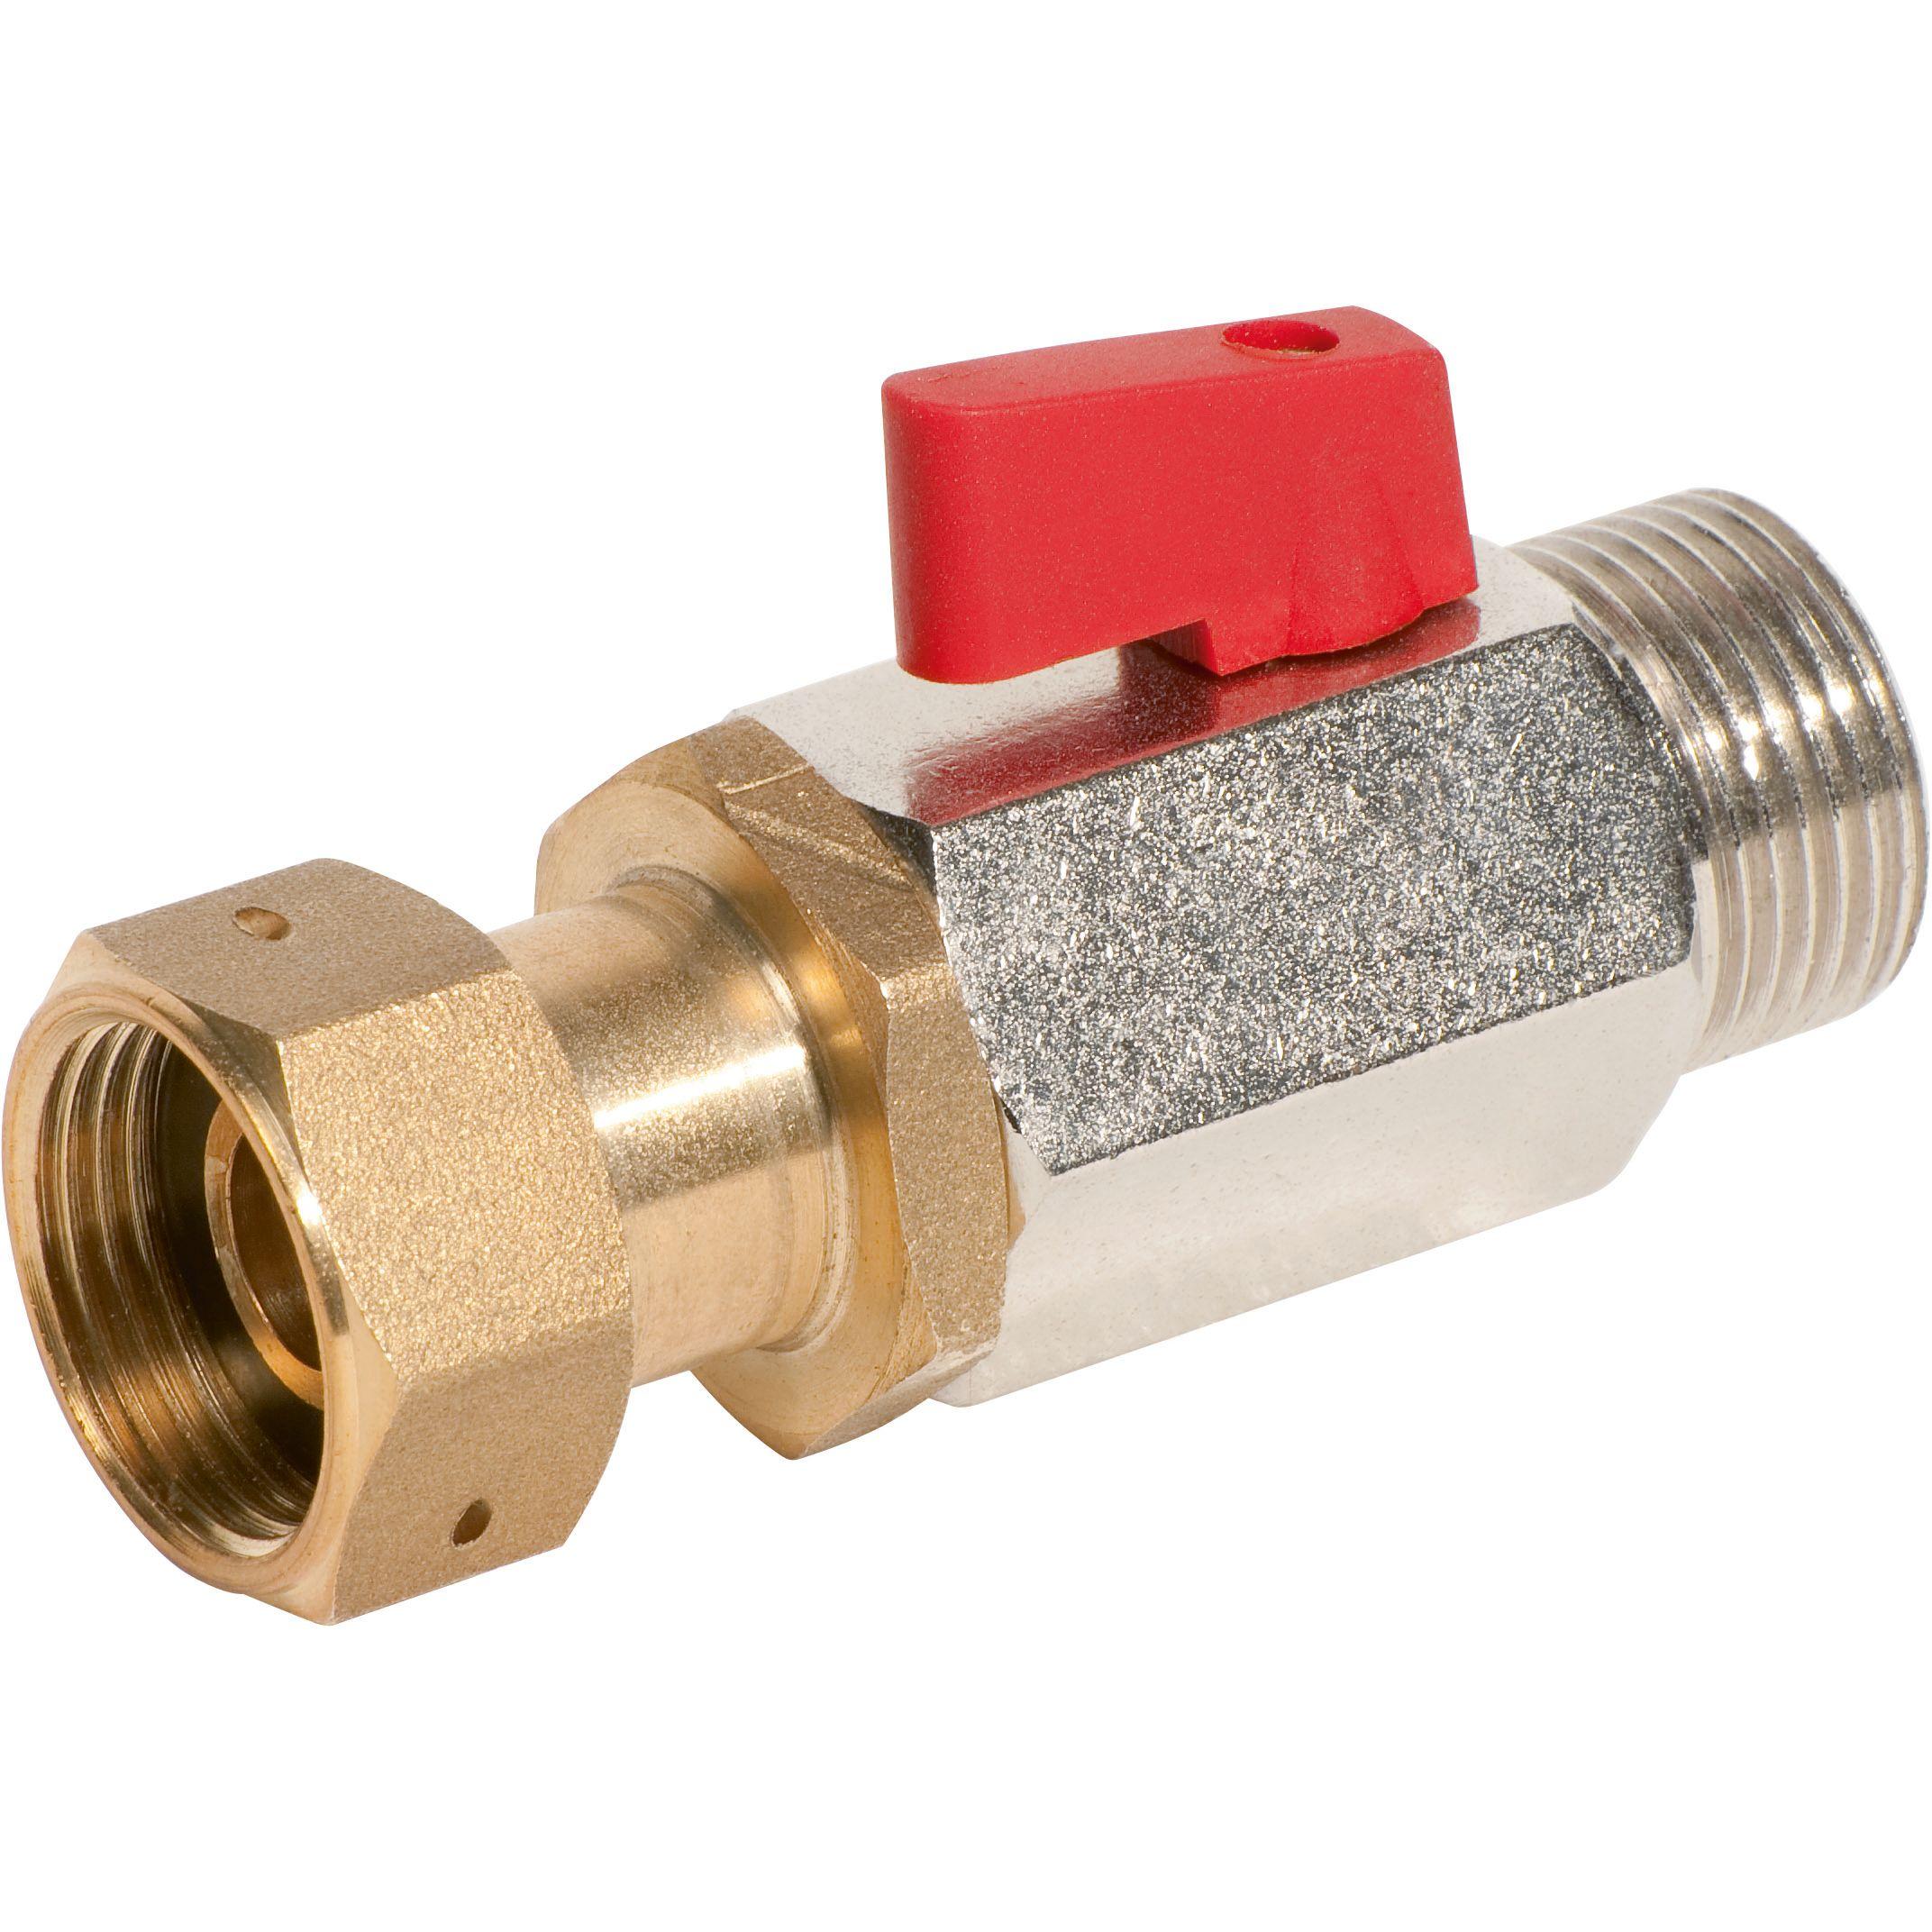 REMS 115324 R Spärrventil 3/4 f/ Solar-Push K60 & I80